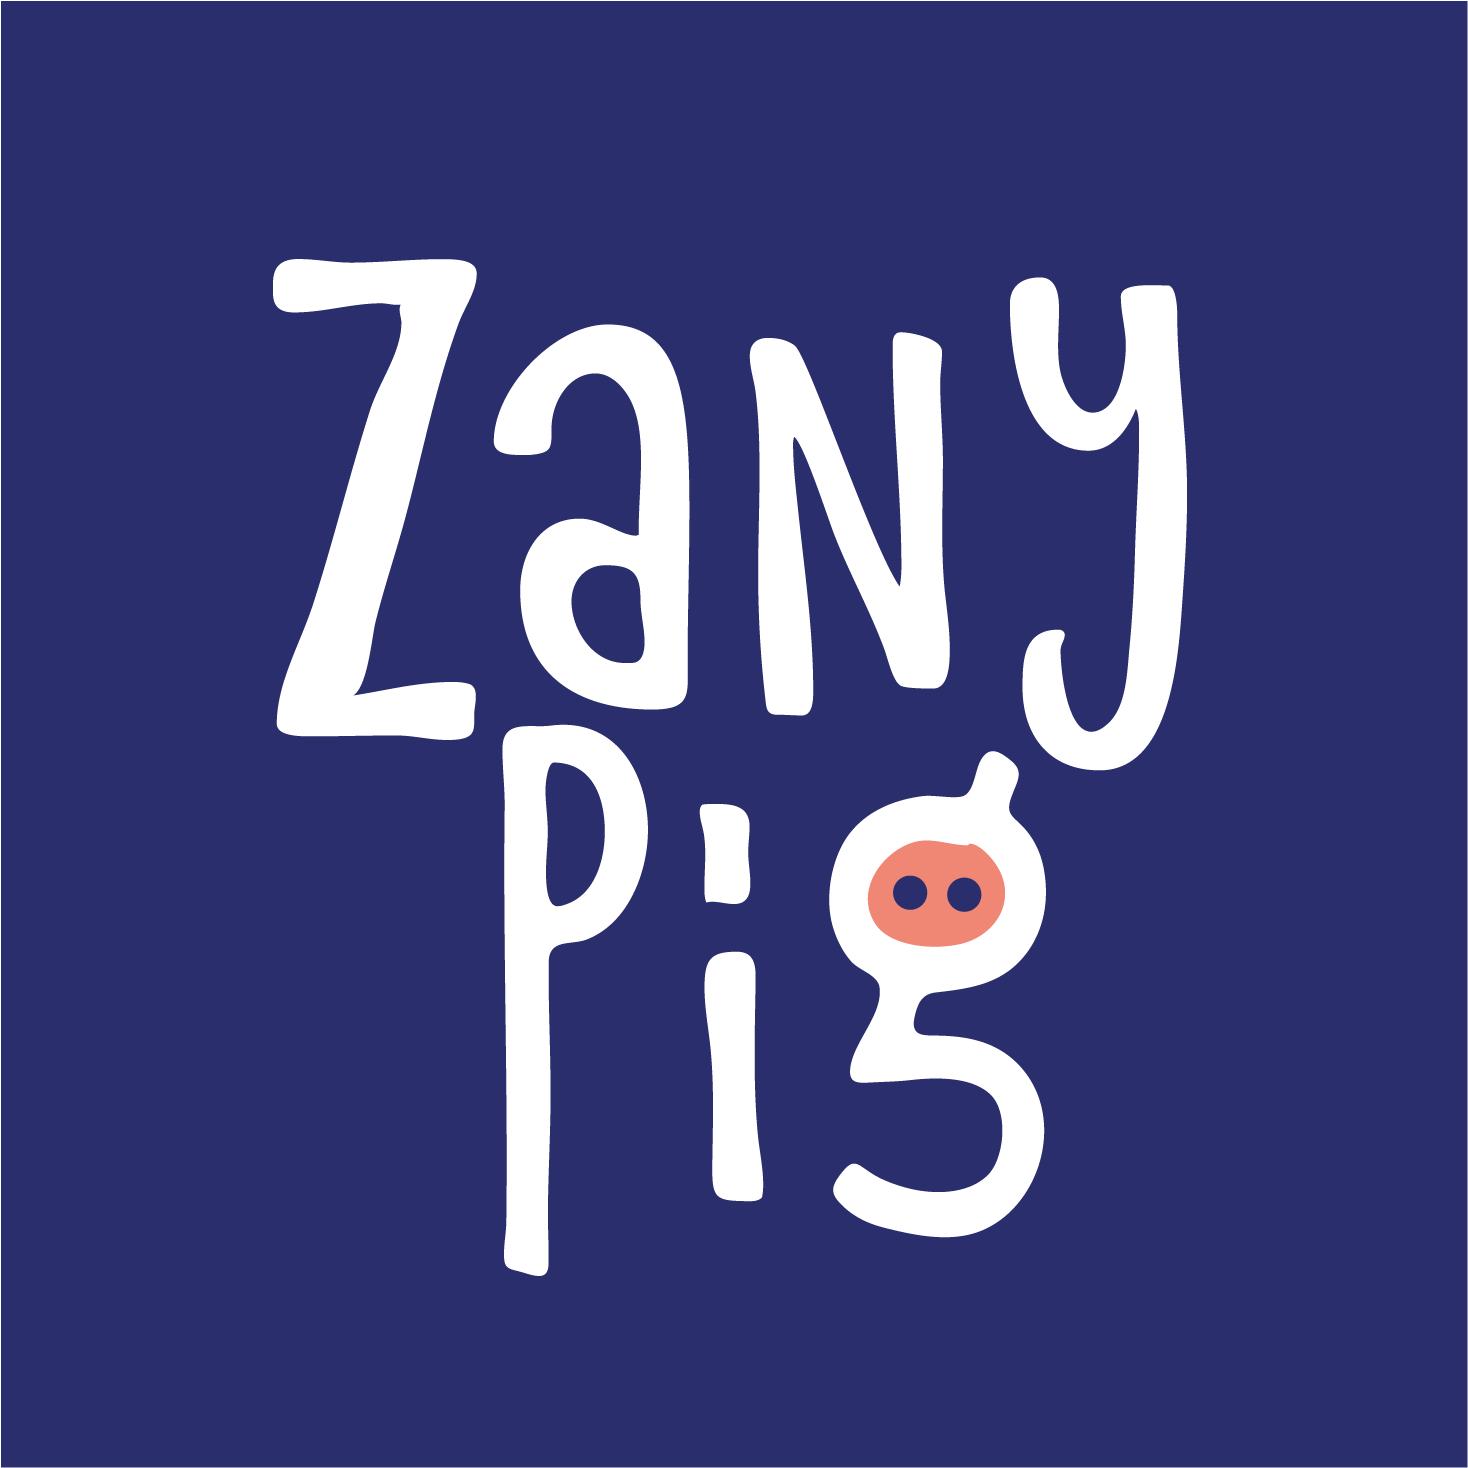 Zanypig's logo